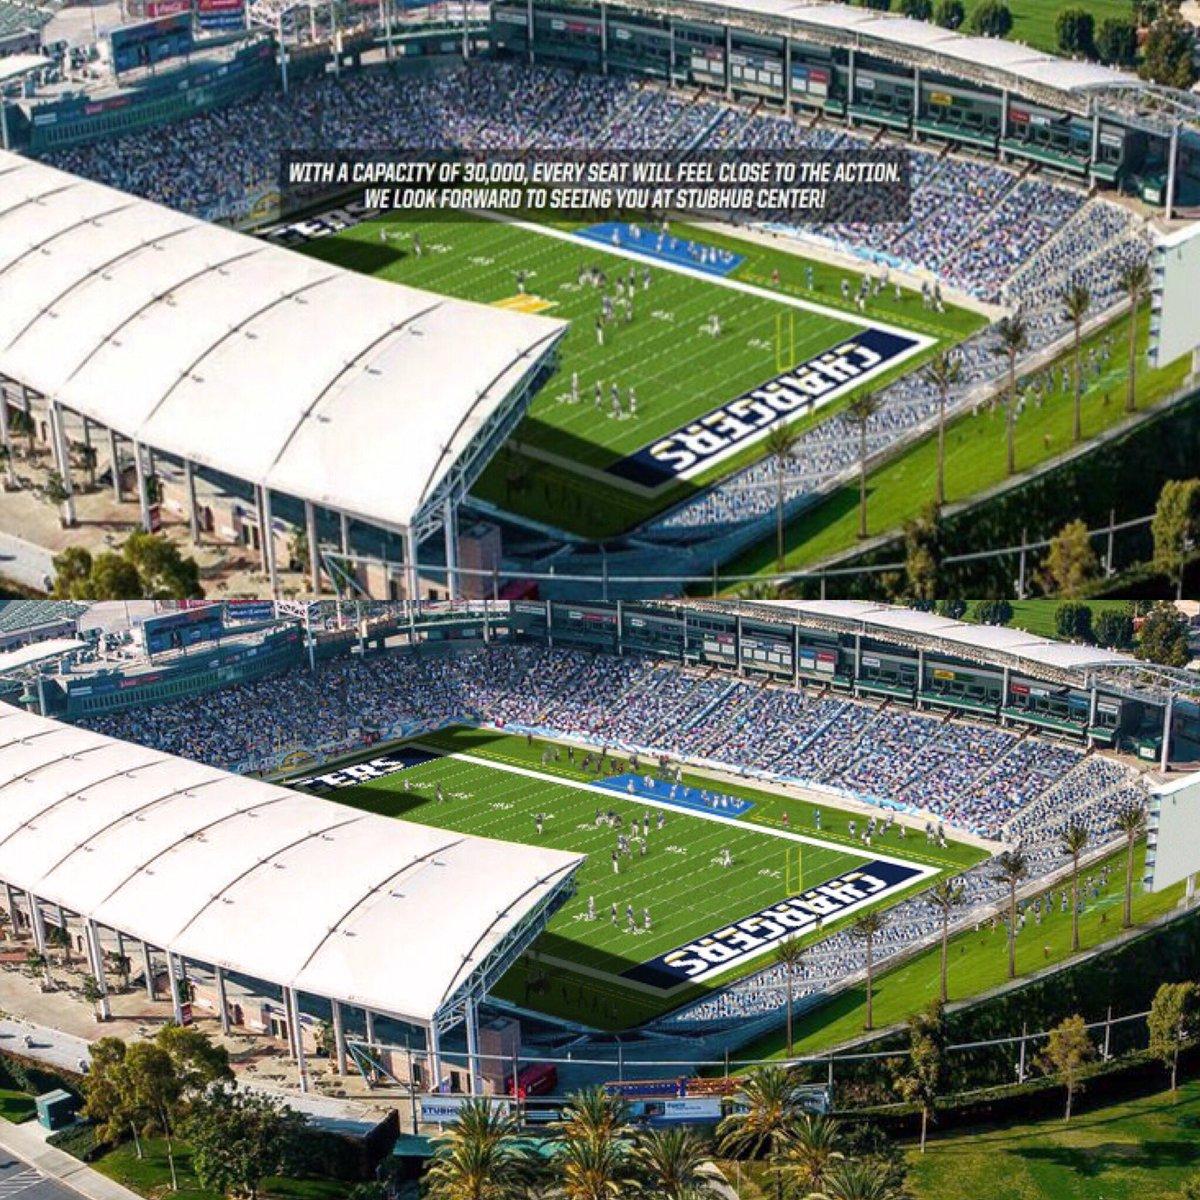 San Diego Chargers Center: Jon Gorden (@JMKRIDE_Jon)